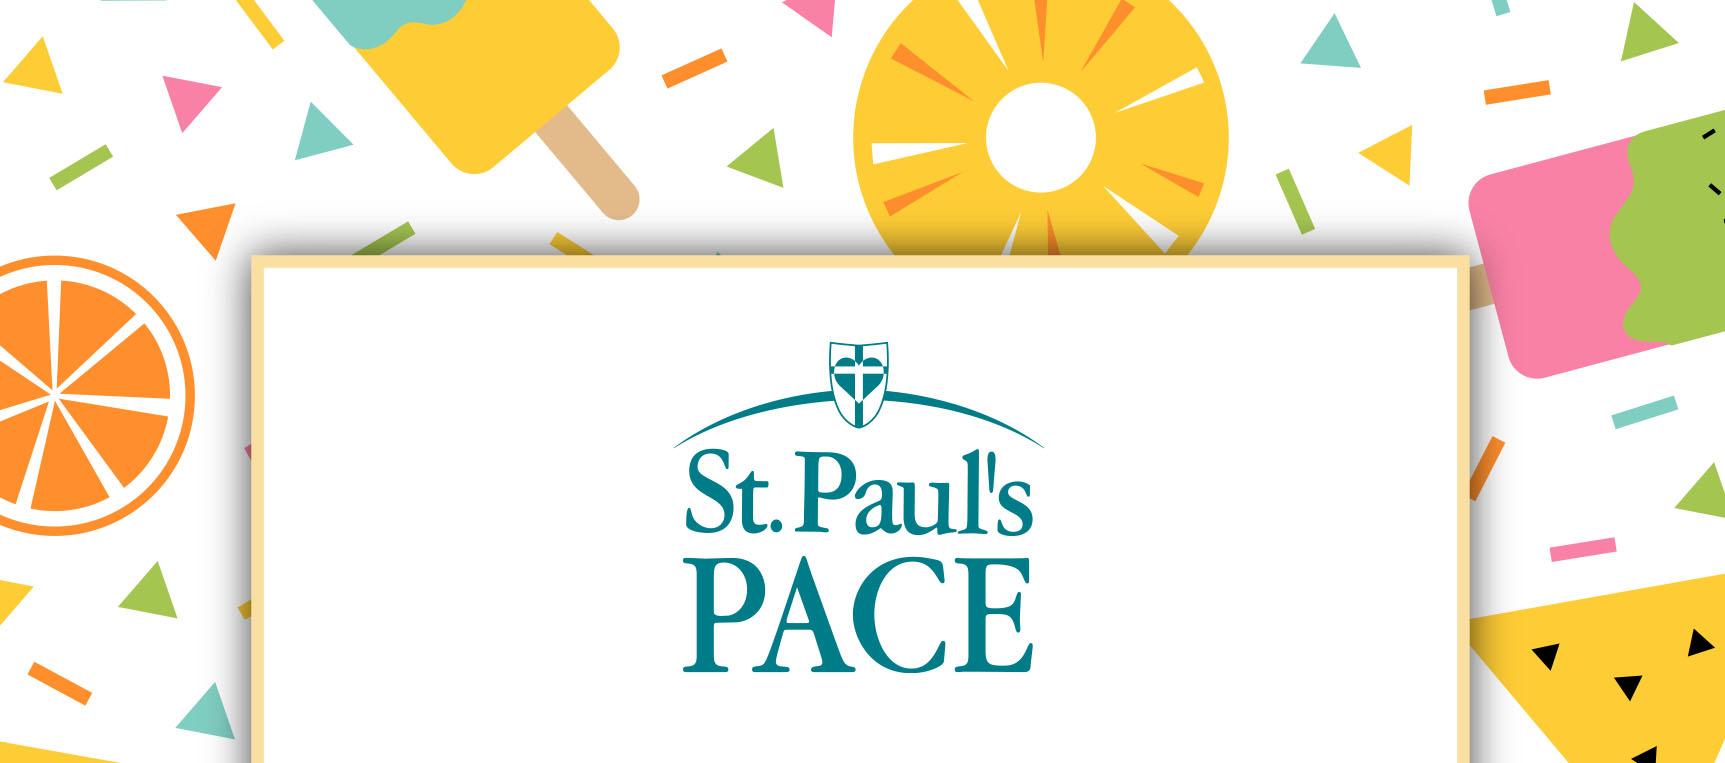 Summer Fan Drive Event at St. Paul's PACE El Cajon